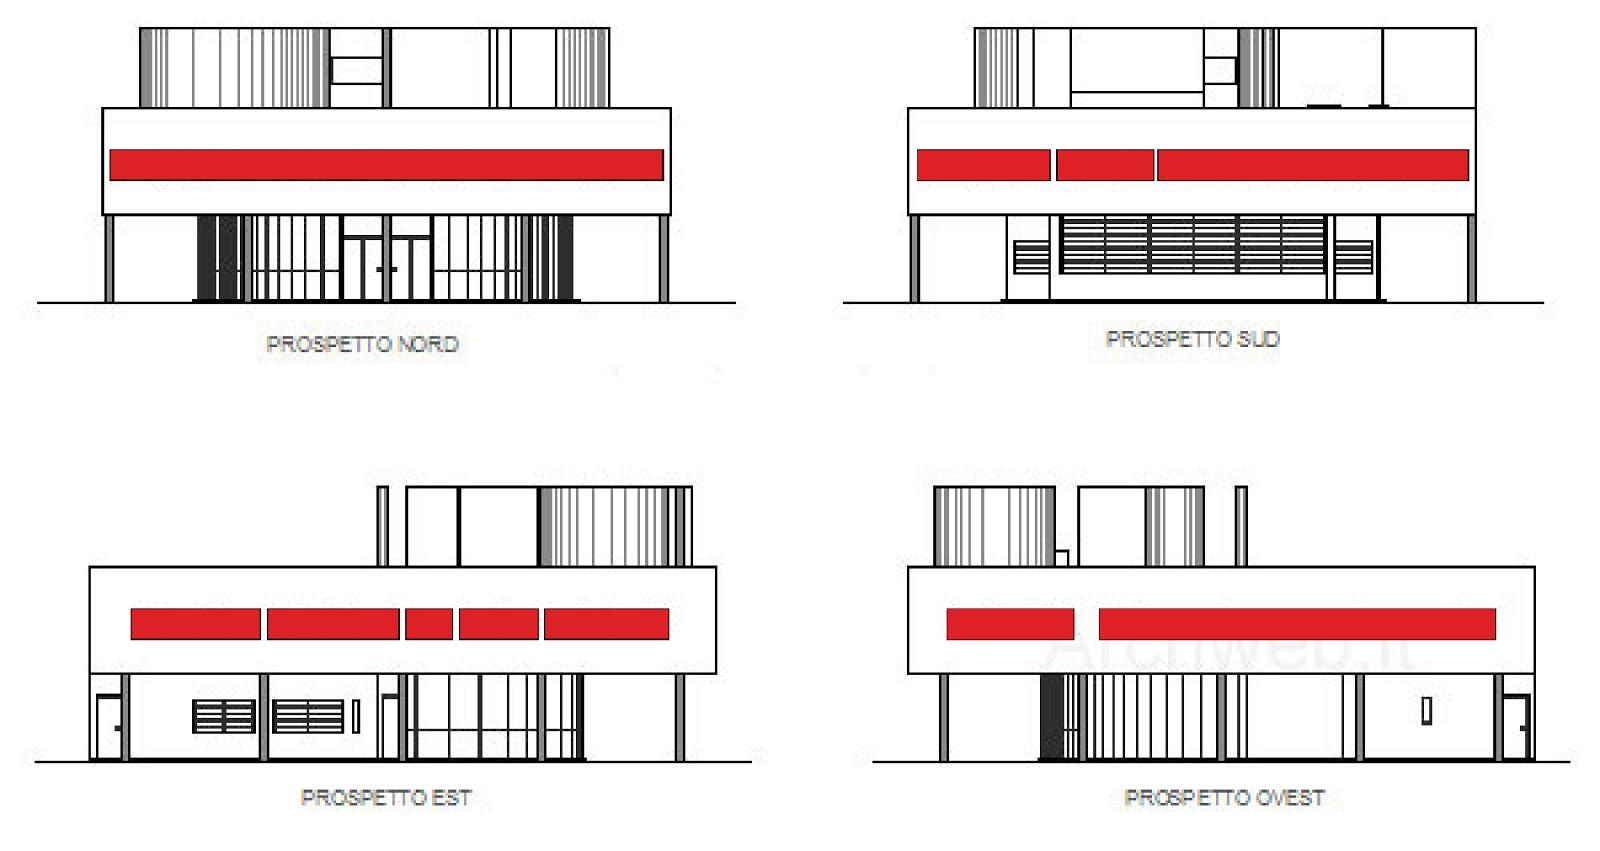 Villa Savoye Front Elevation : D modeling